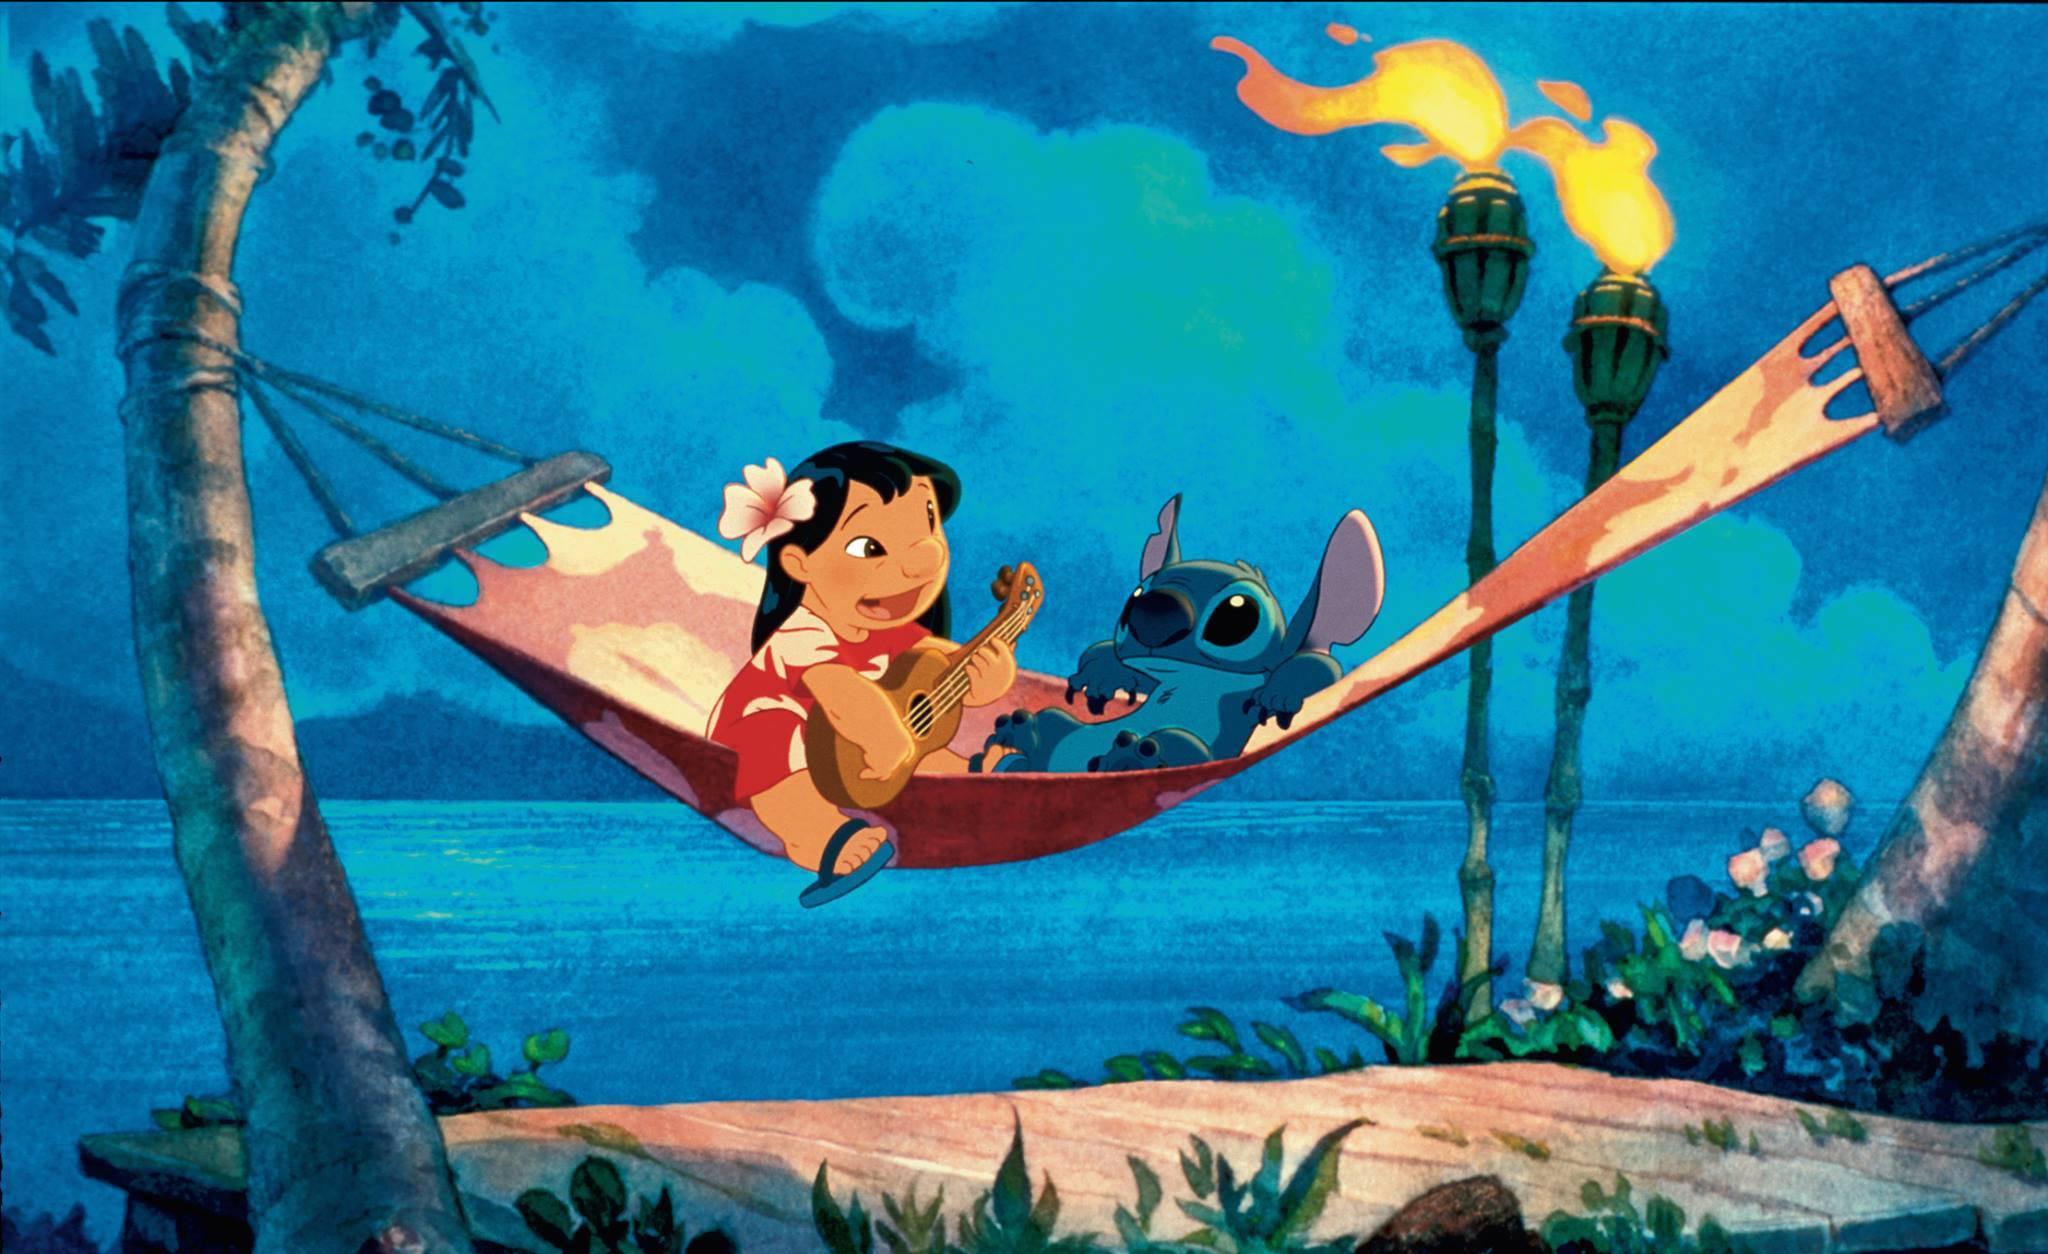 Disney Lilo & Stitch live action